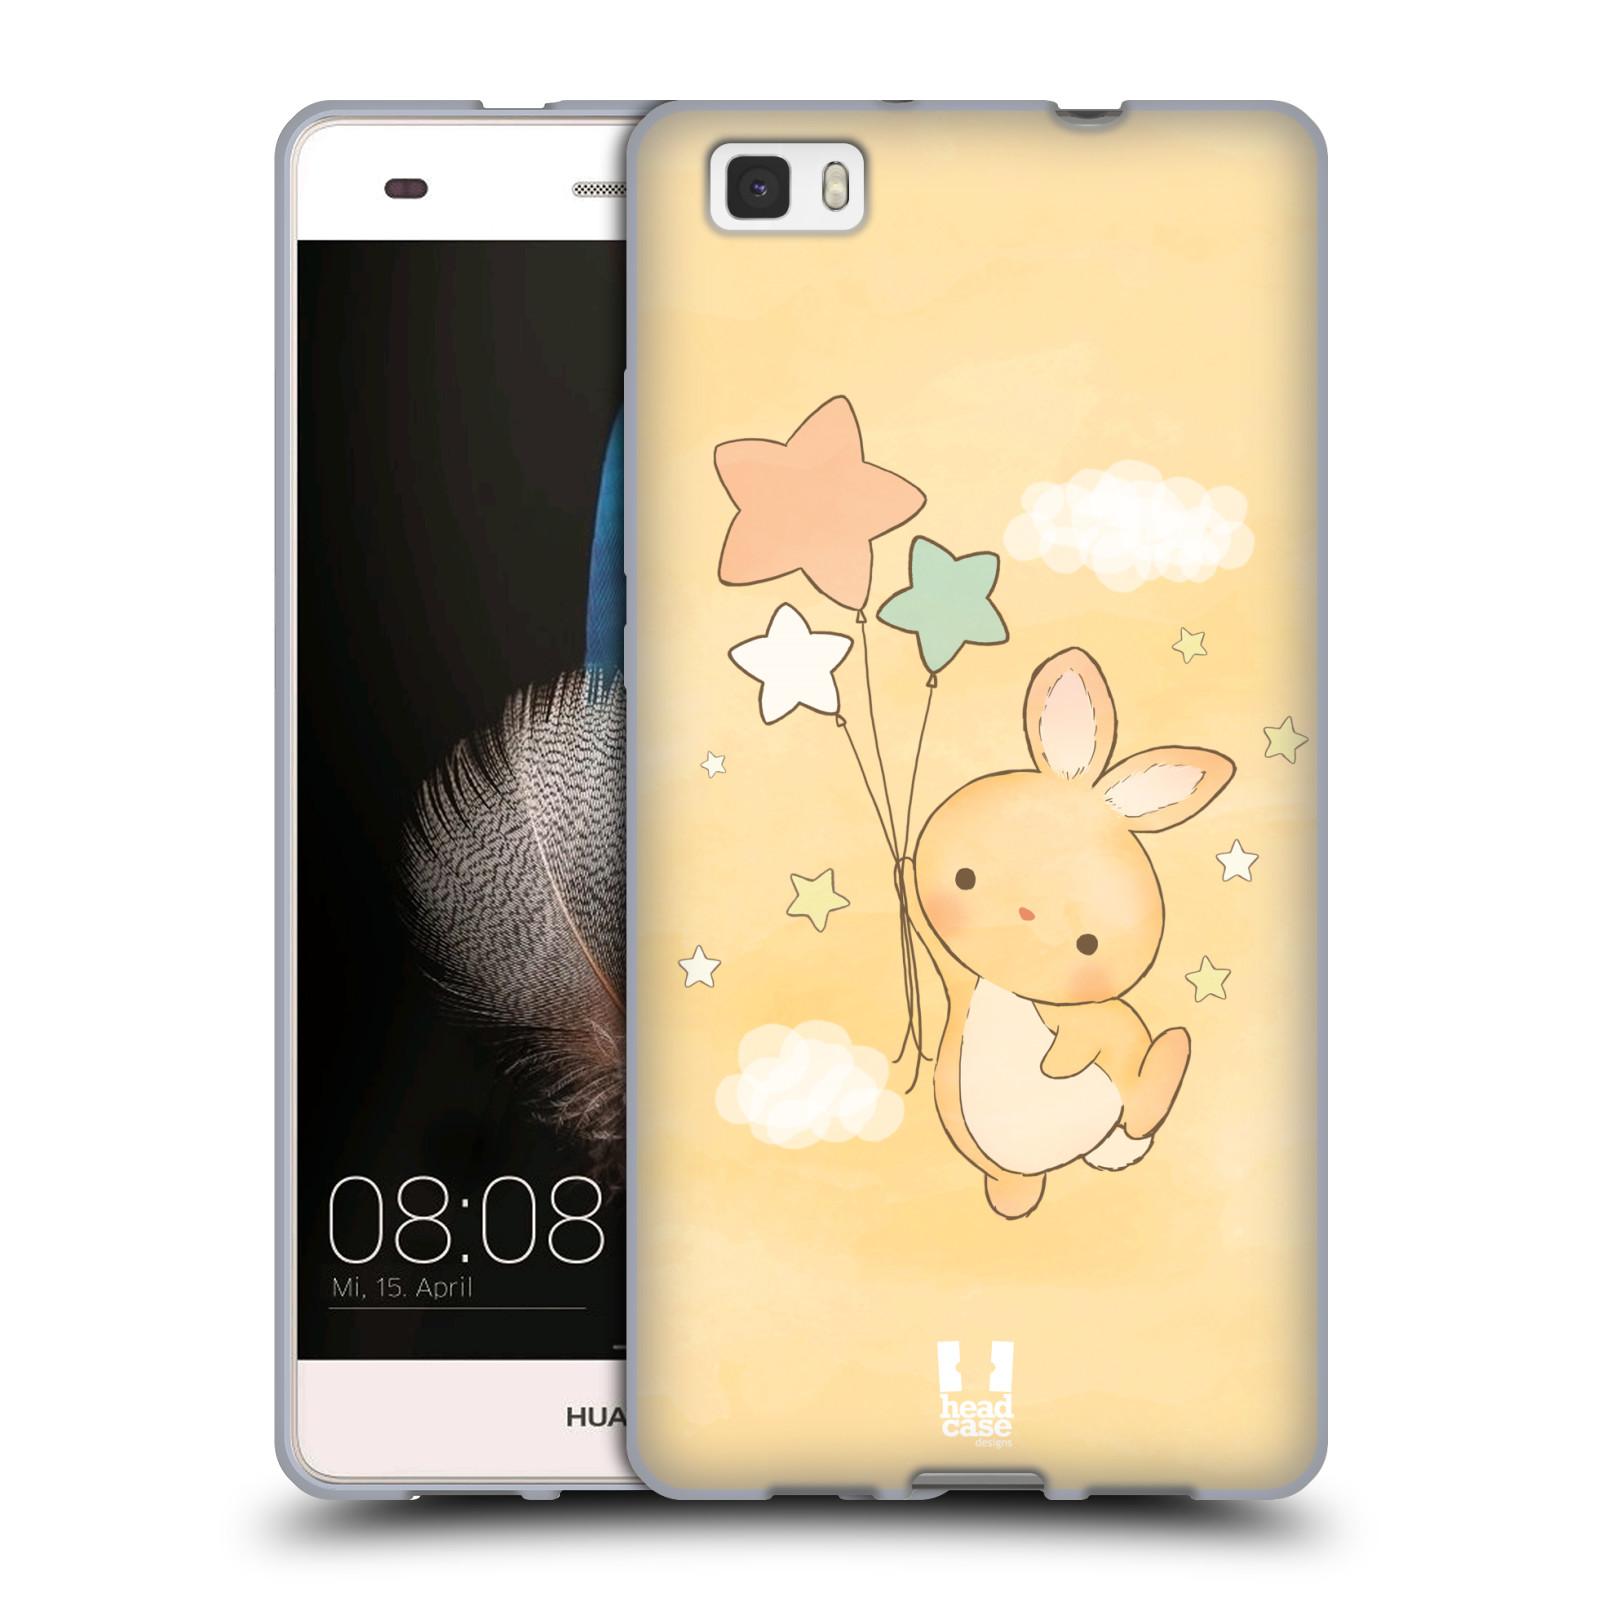 HEAD CASE silikonový obal na mobil HUAWEI P8 LITE vzor králíček a hvězdy žlutá